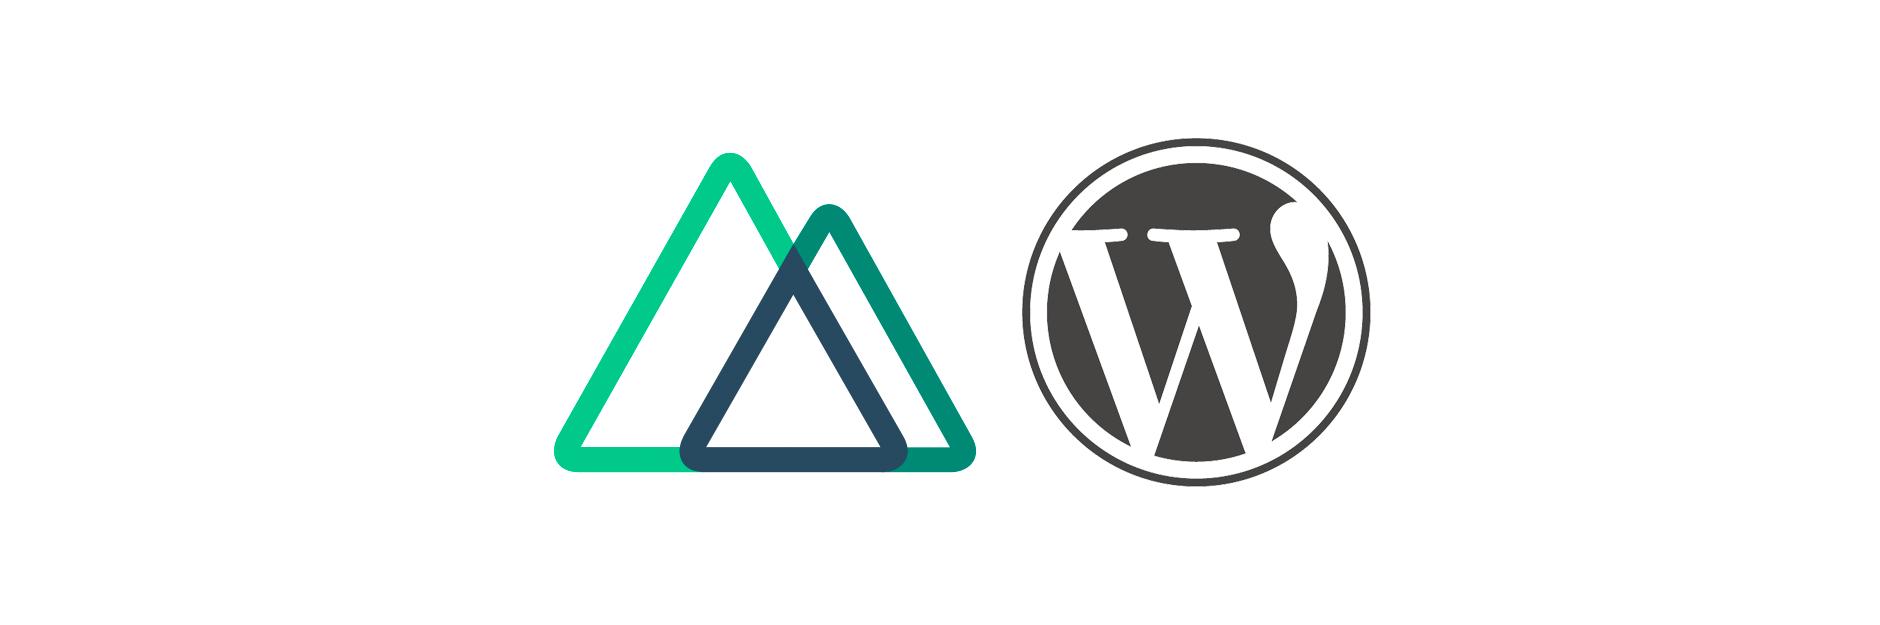 Nuxt.jsでWordPressの記事をNetlifyにデプロイする(ざっくり版)